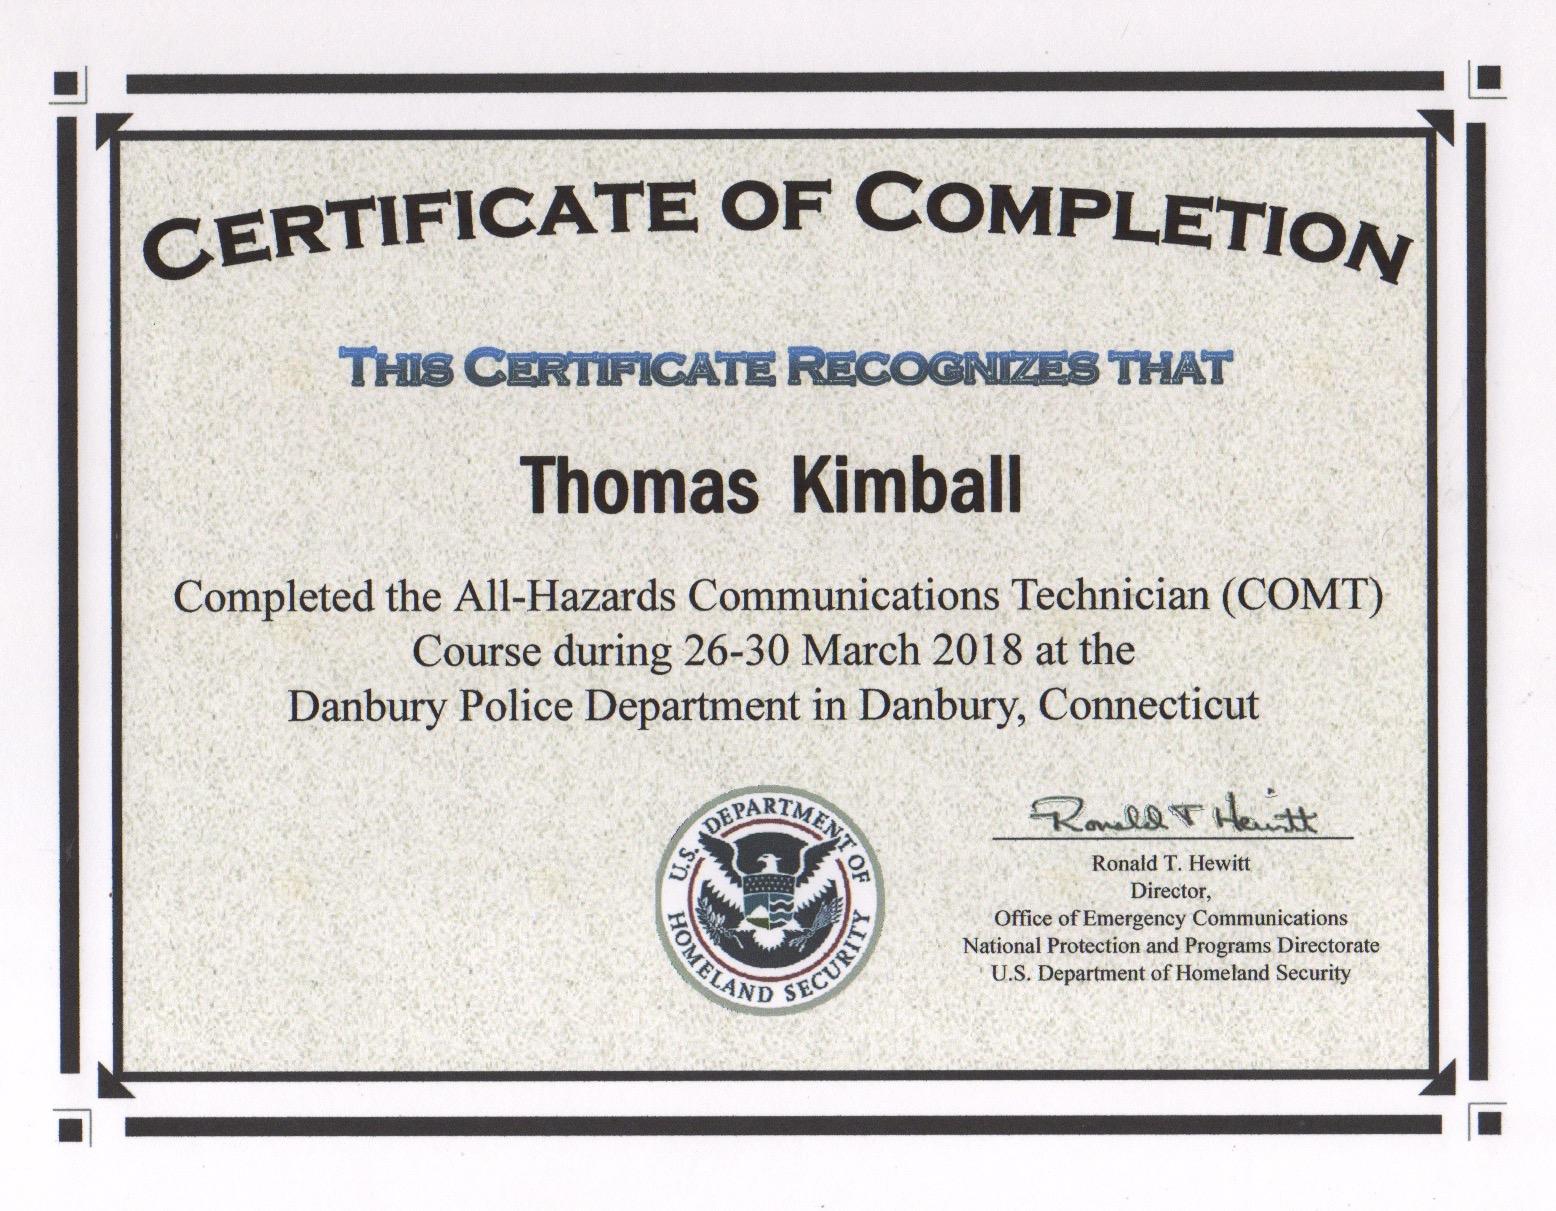 All-Hazards Communications Technician (COMT) Course Certificate